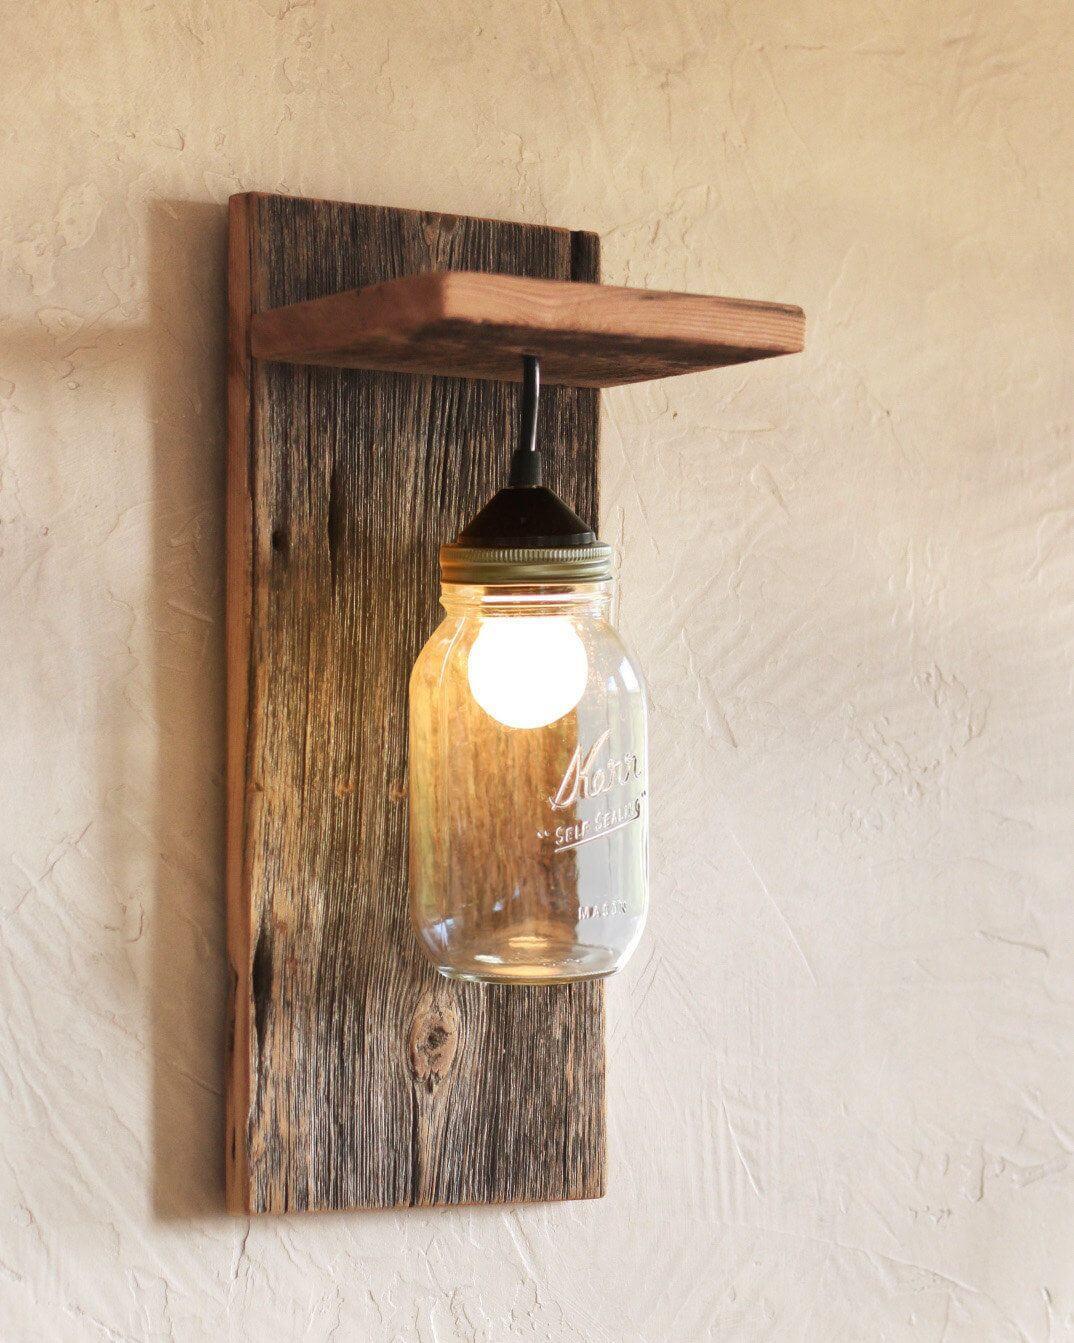 Raw Wood Wall Sconce With Mason Jar